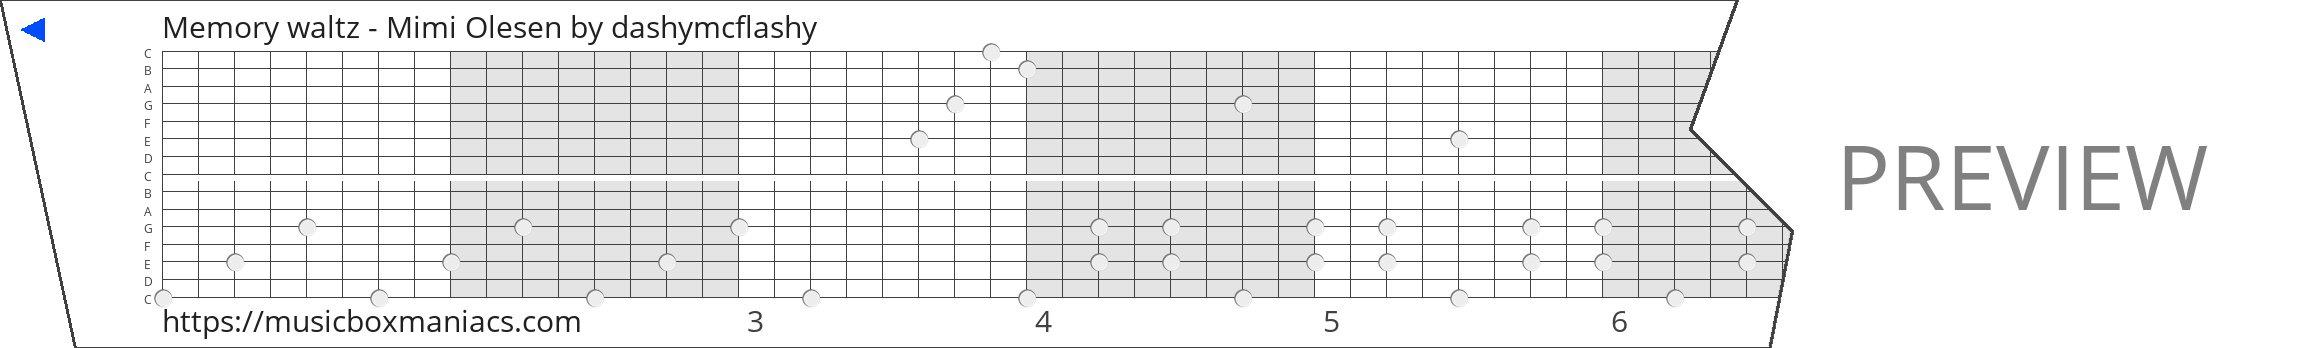 Memory waltz - Mimi Olesen 15 note music box paper strip